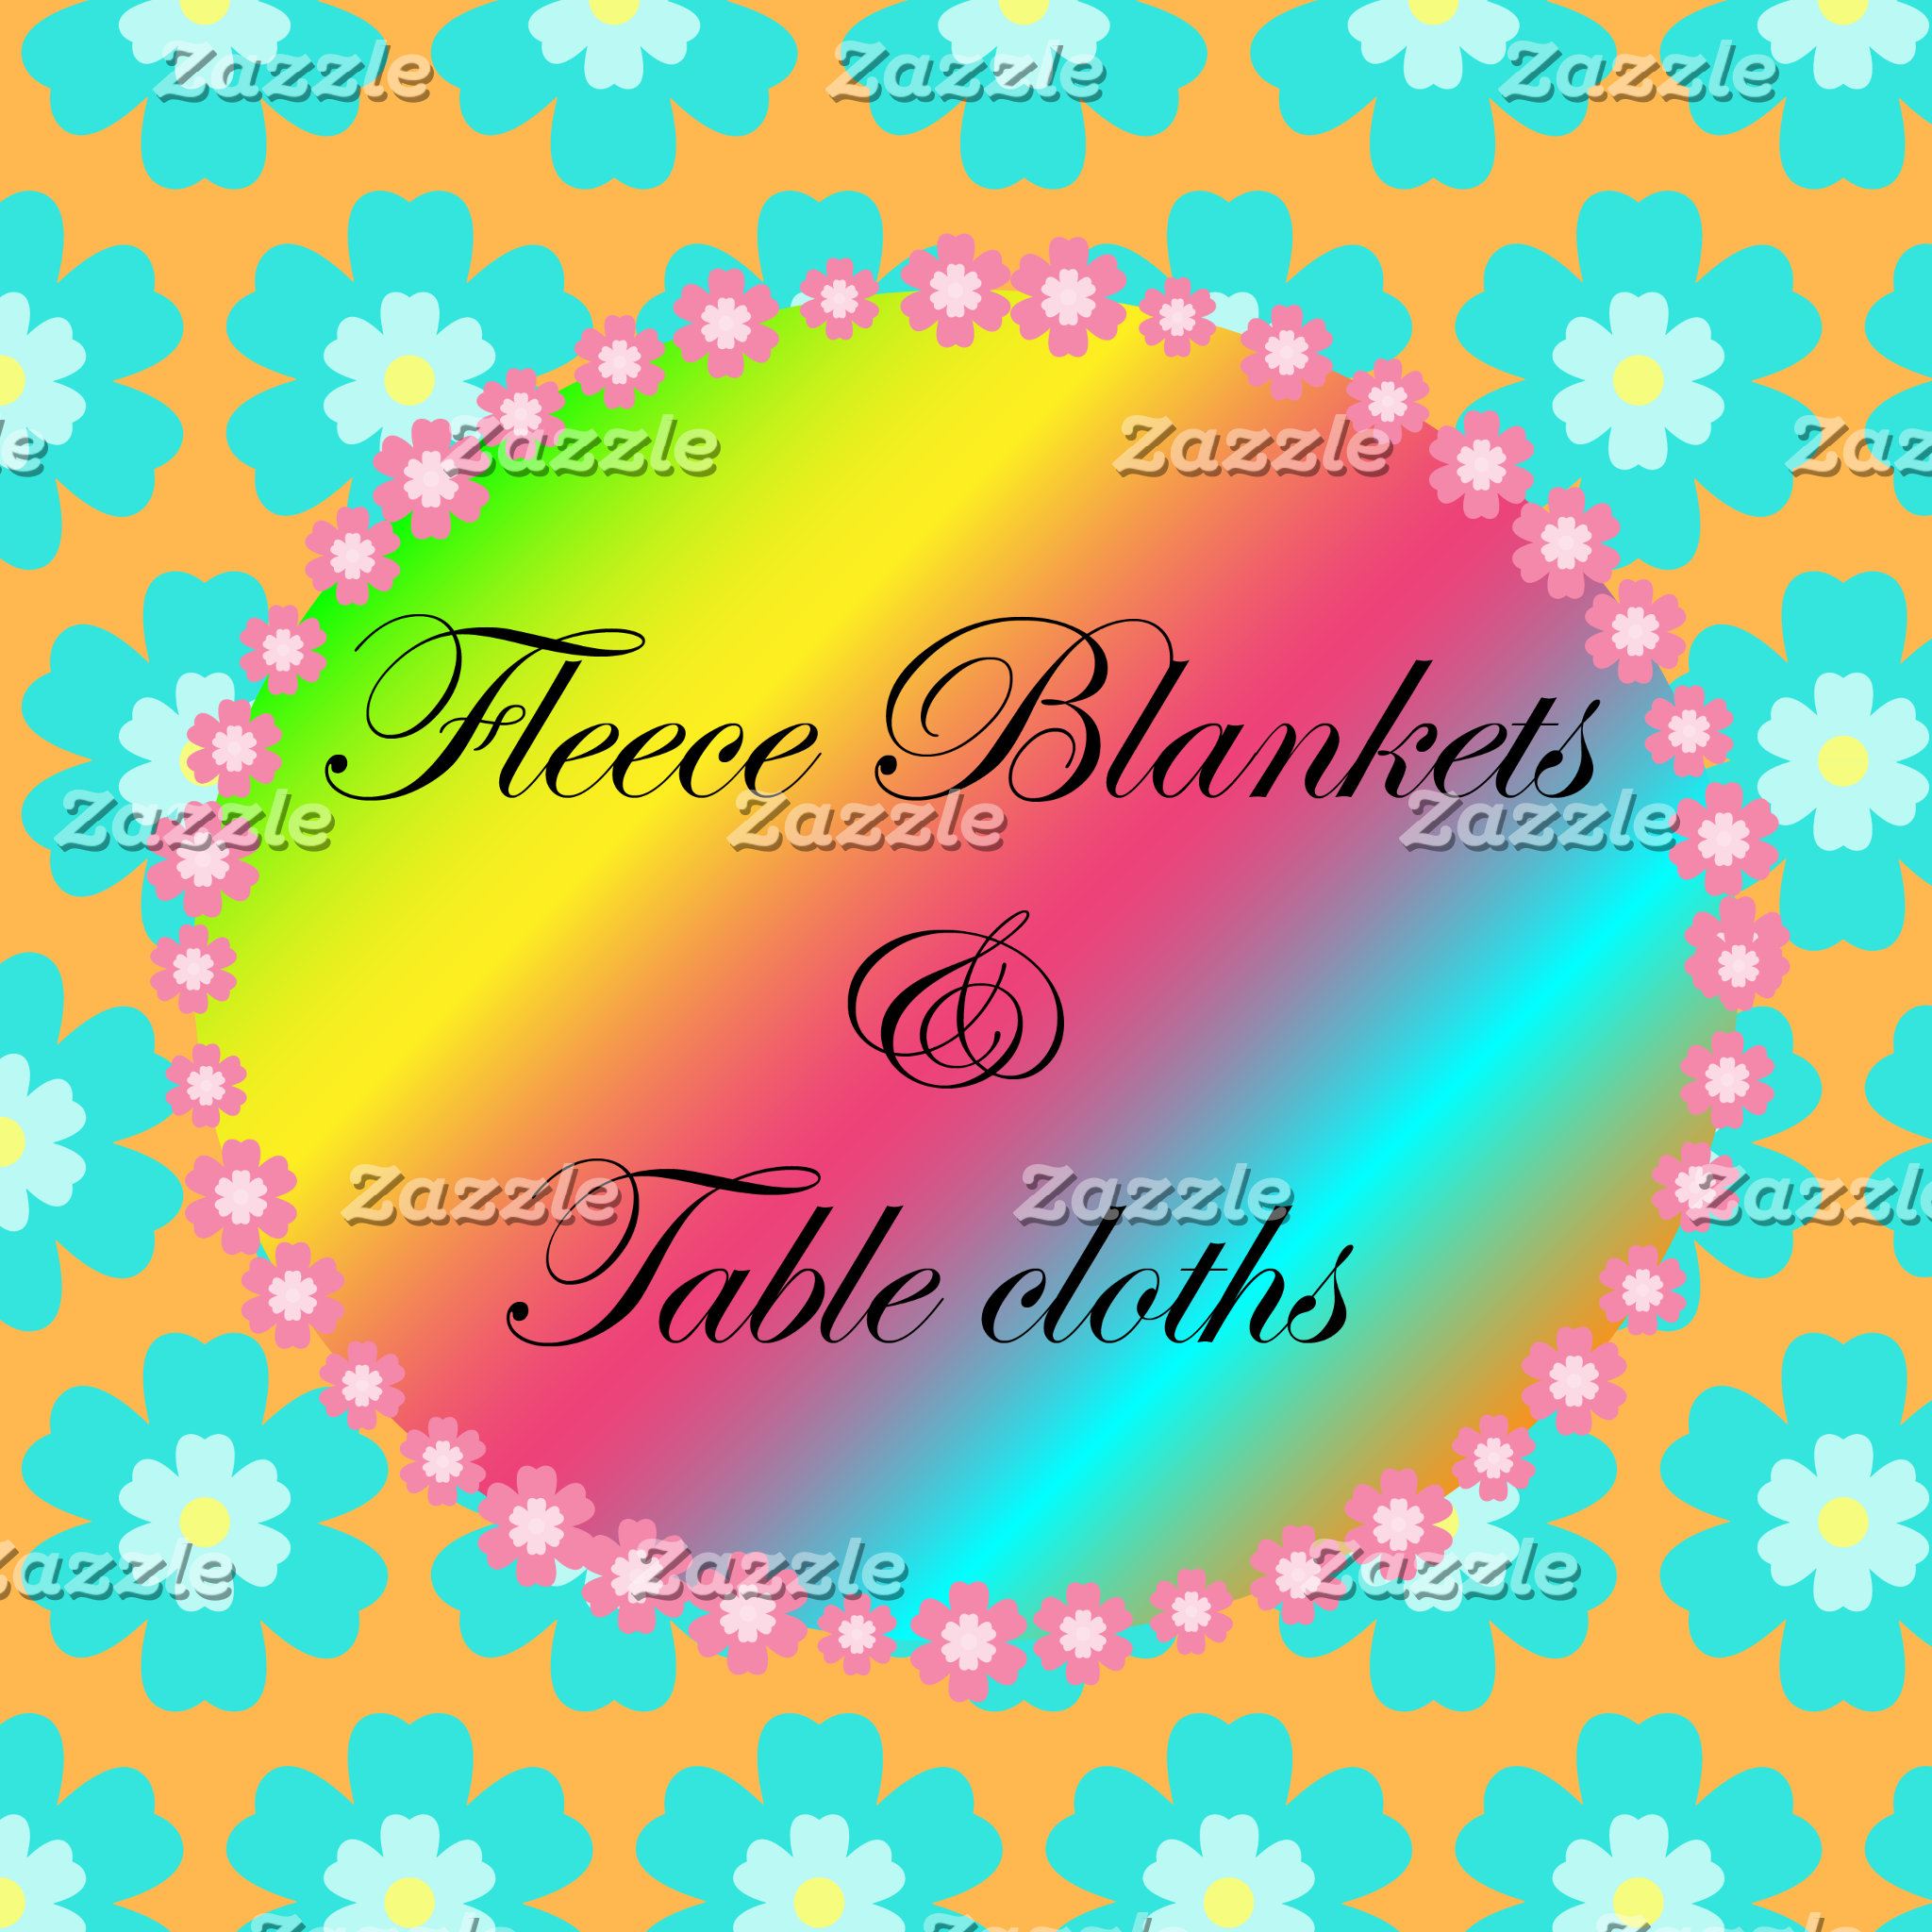 03. Fleece Blankets And Table Cloths